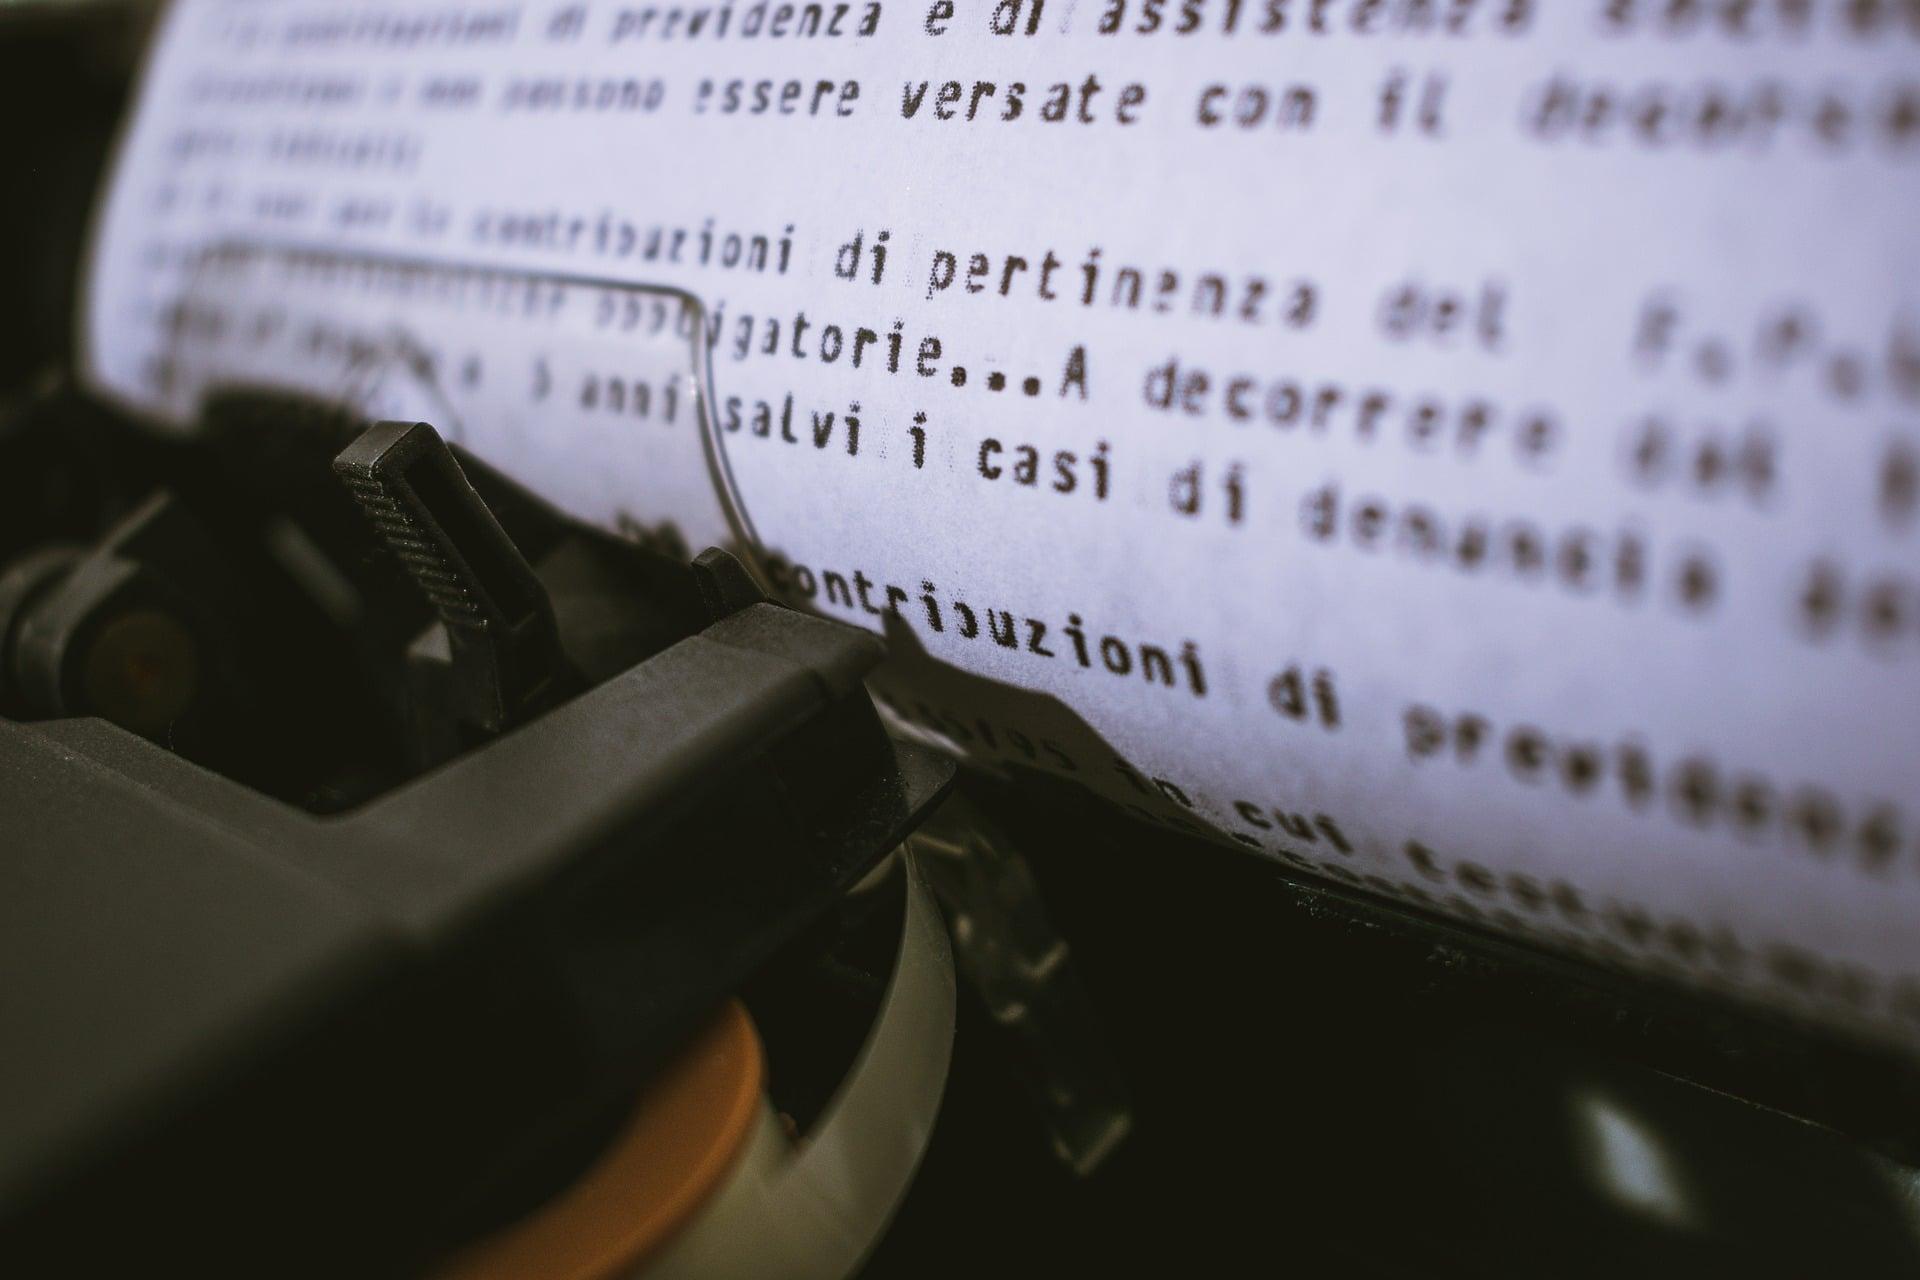 European Single Procurement Document– An Outline for Suppliers